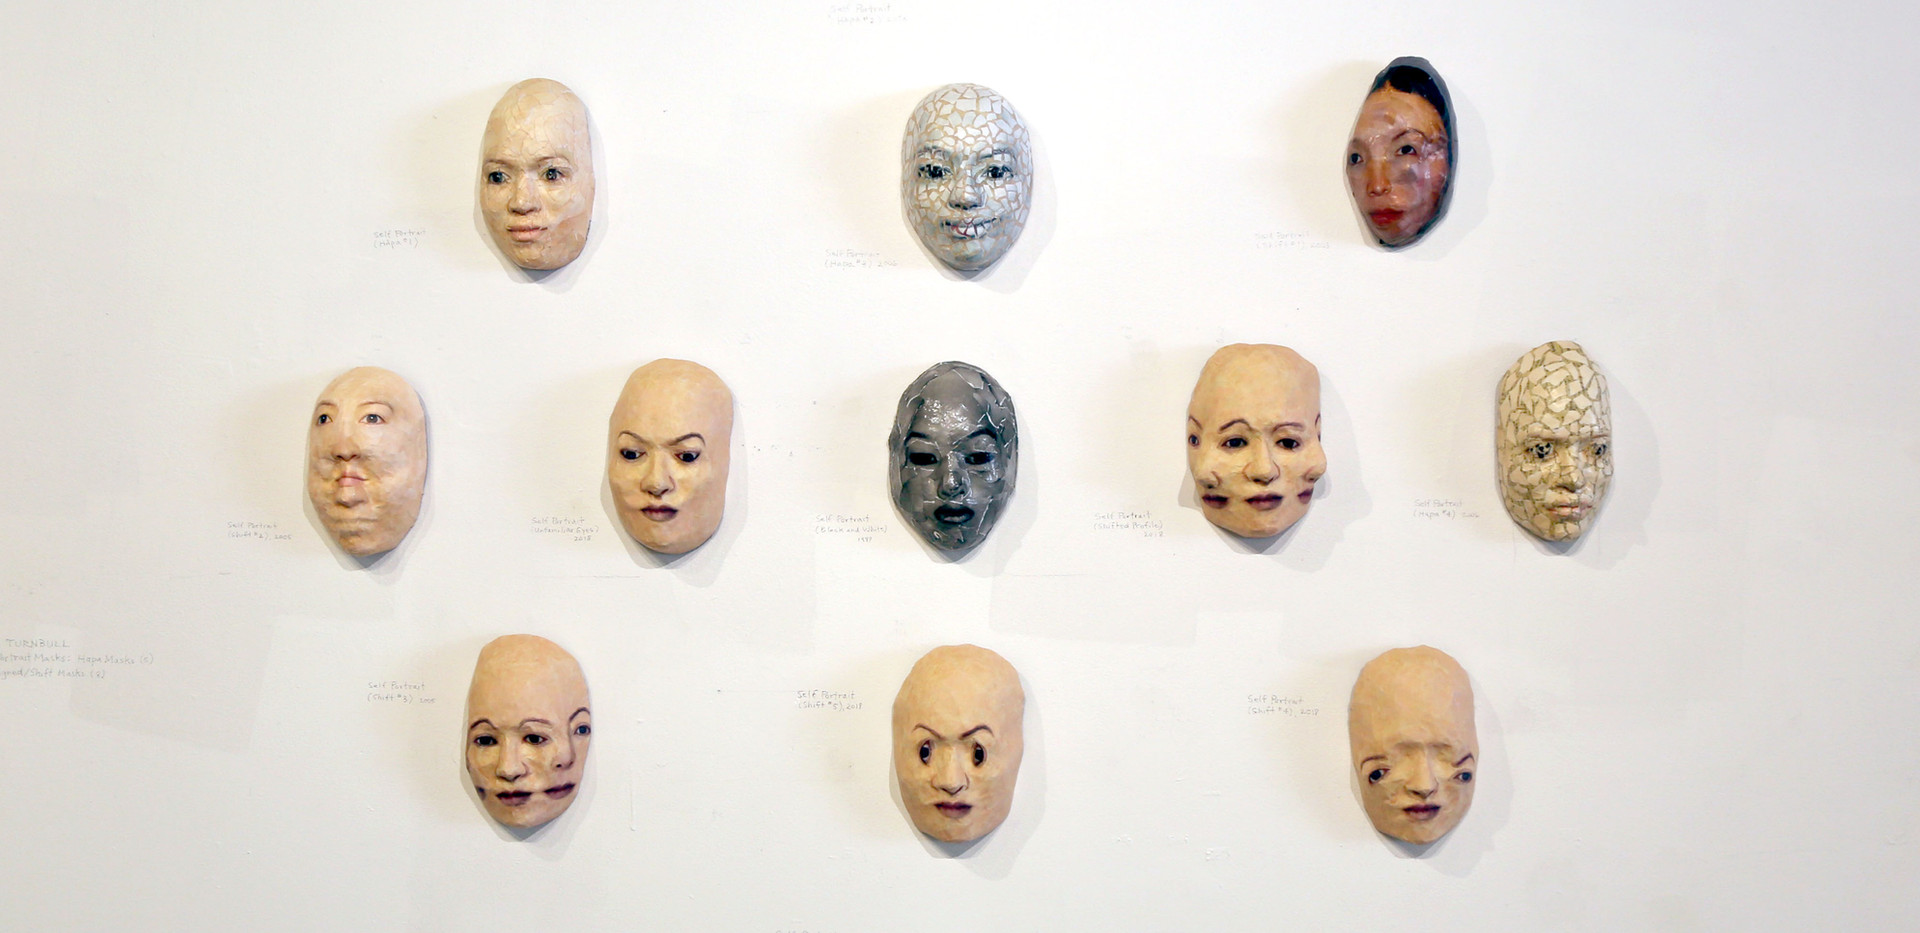 MTurnbull-Mask Exhibit at JCCC3